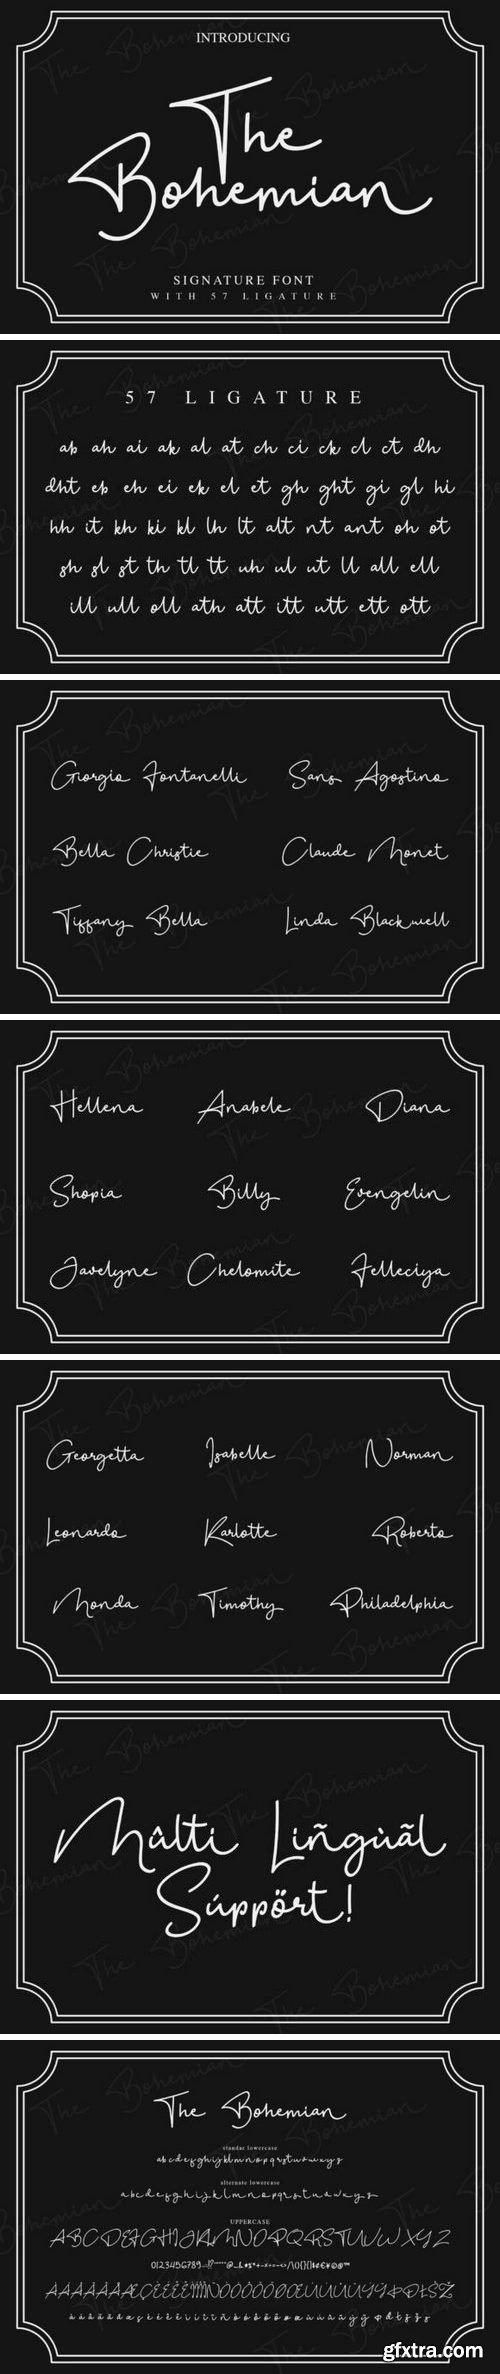 Fontbundles - The Bohemian - a Signature Font 179116